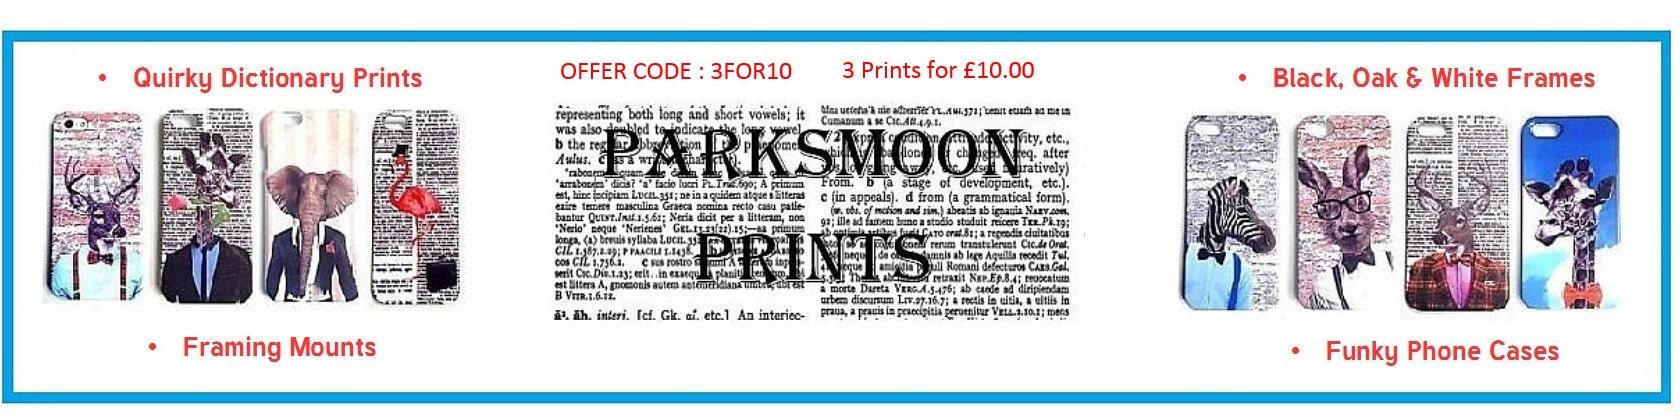 We design quirky dictionary prints & phone von ParksMoonPrints